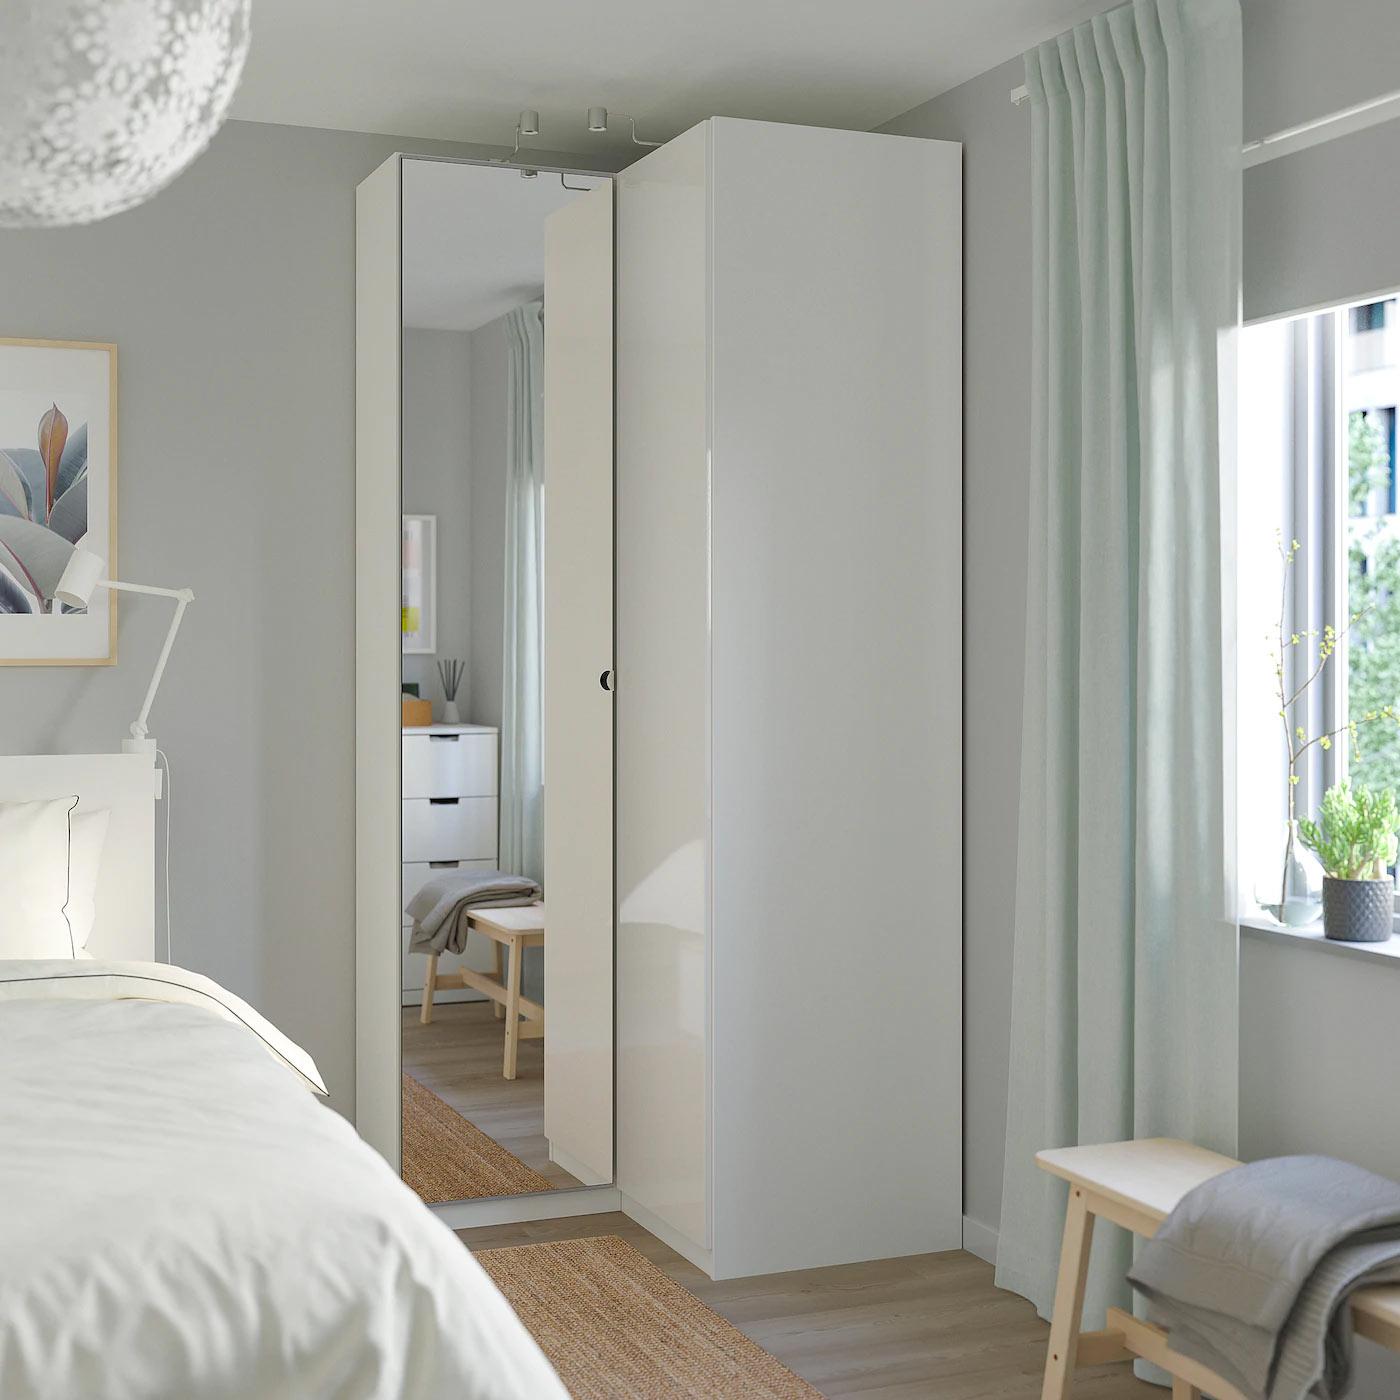 idee salvaspazio IKEA sfruttando gli angoli